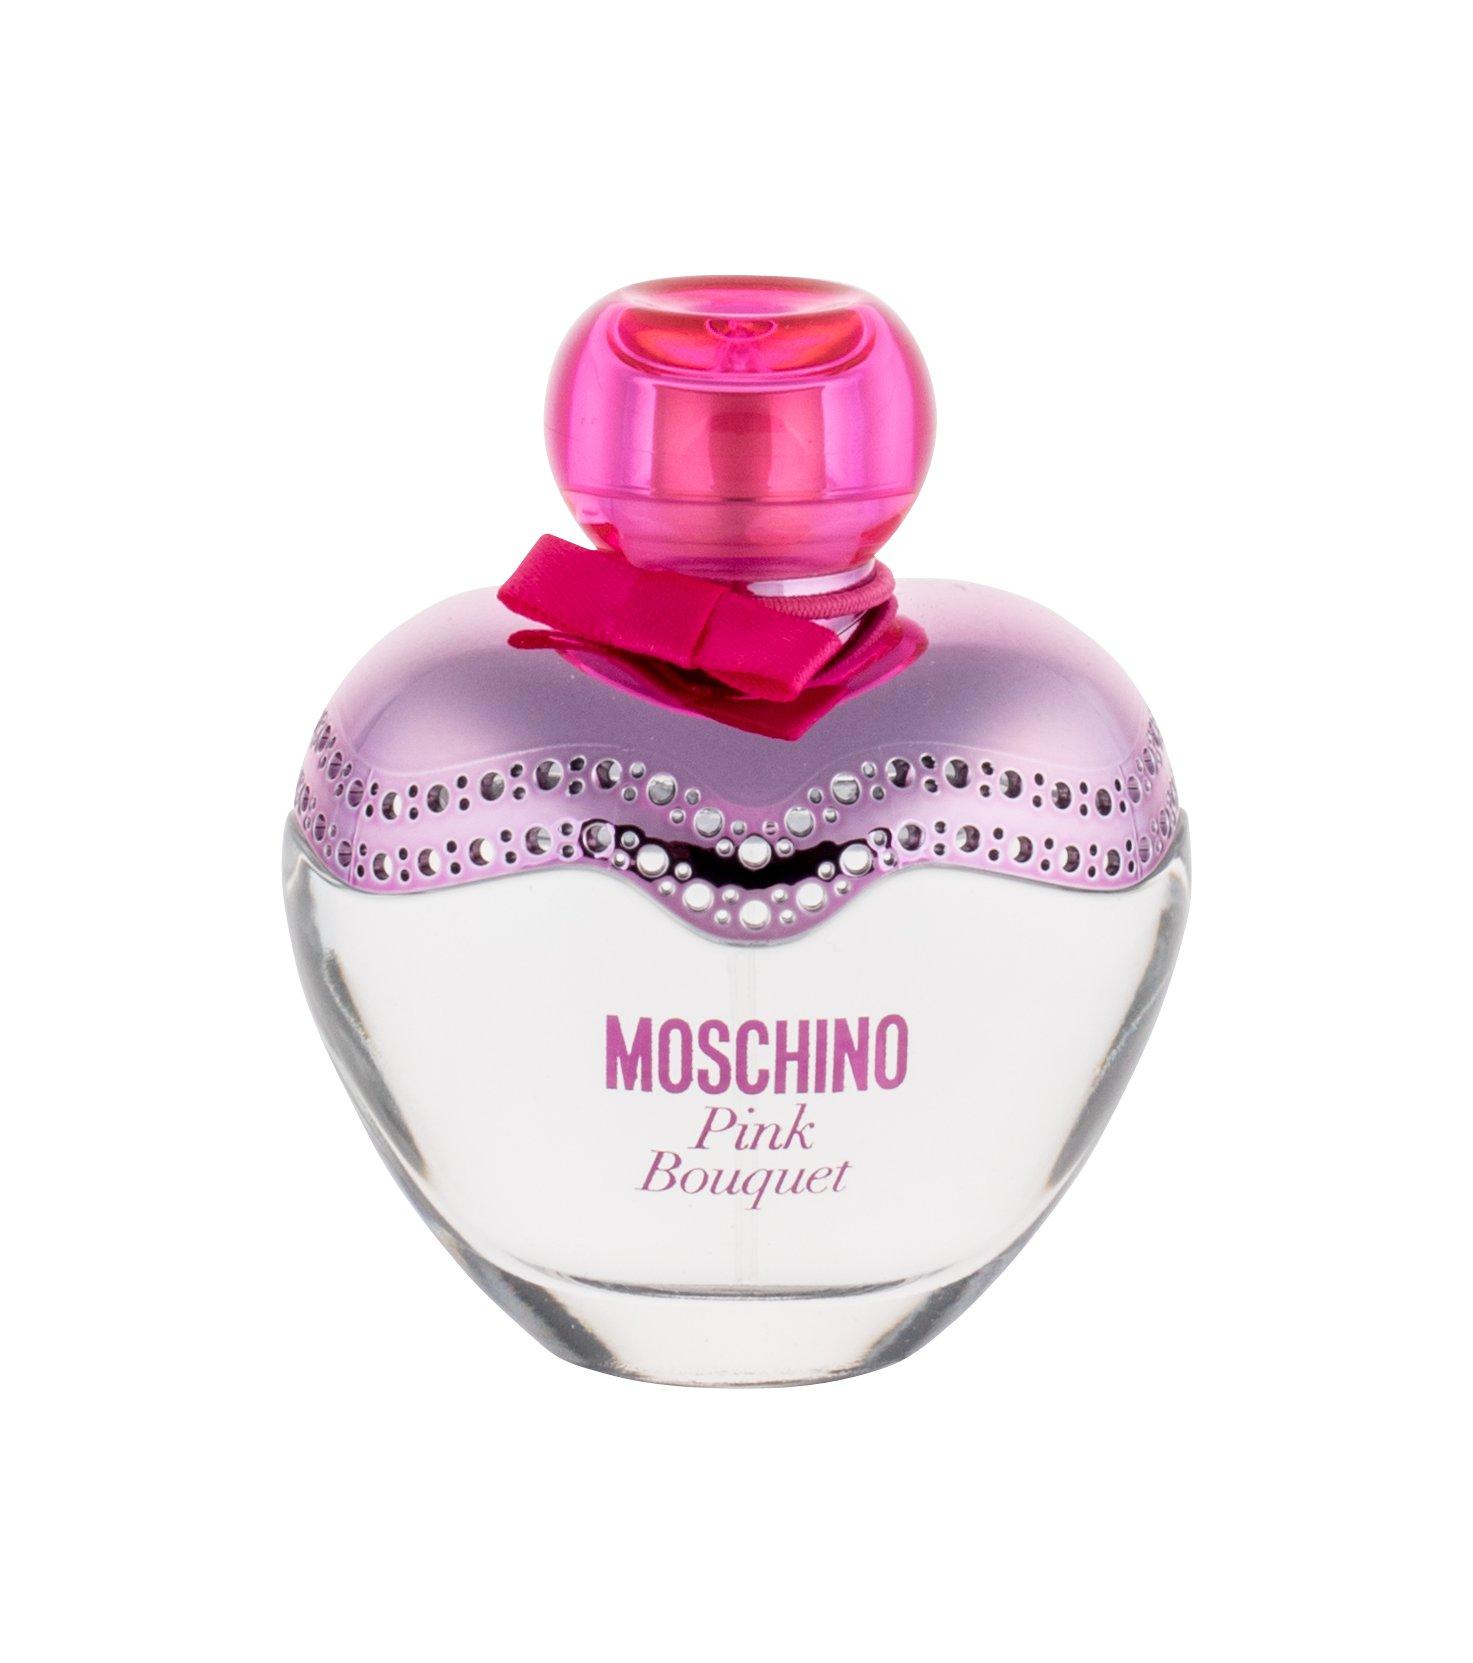 Moschino Pink Bouquet, Toaletná voda 50ml